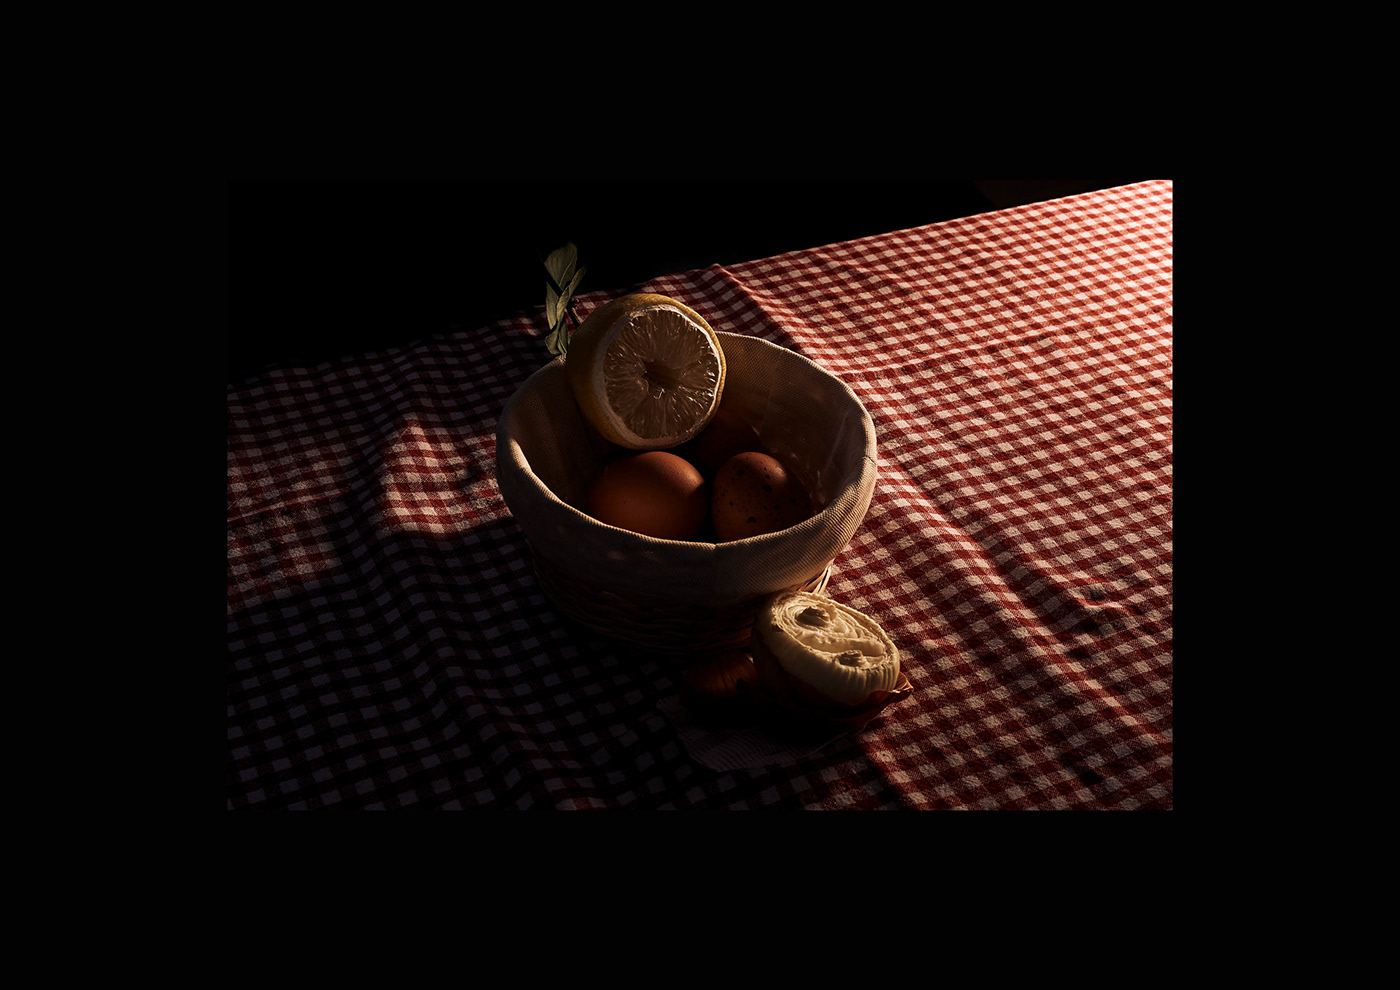 art capture one Coronavirus InDesign loneliness Photography  photoshop Quarantine still life Adobe Portfolio